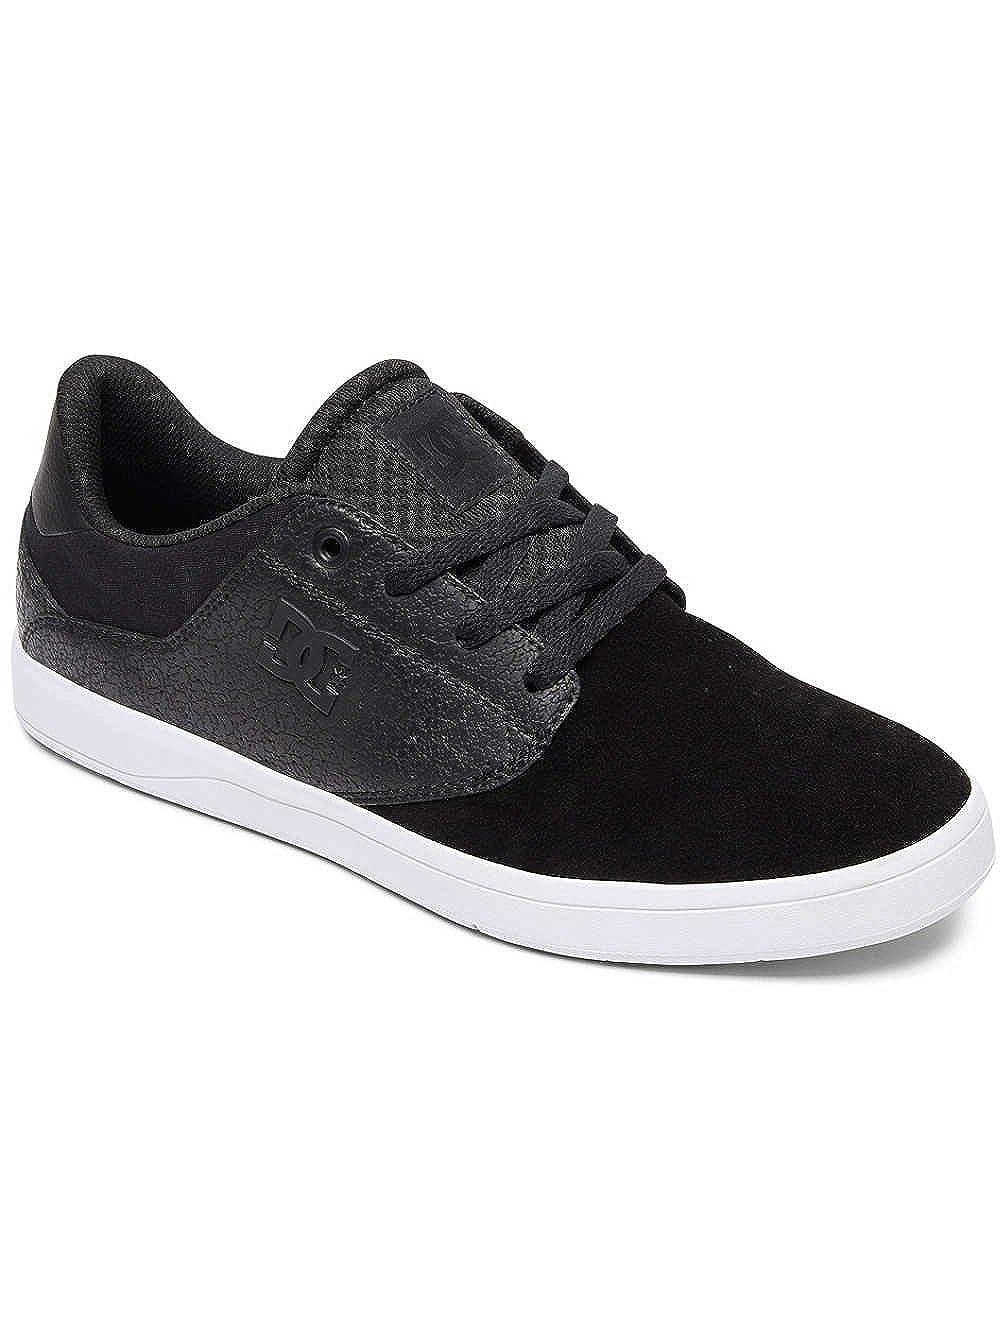 DC Shoes Men/'s Notch M Shoe Low-Top Sneakers